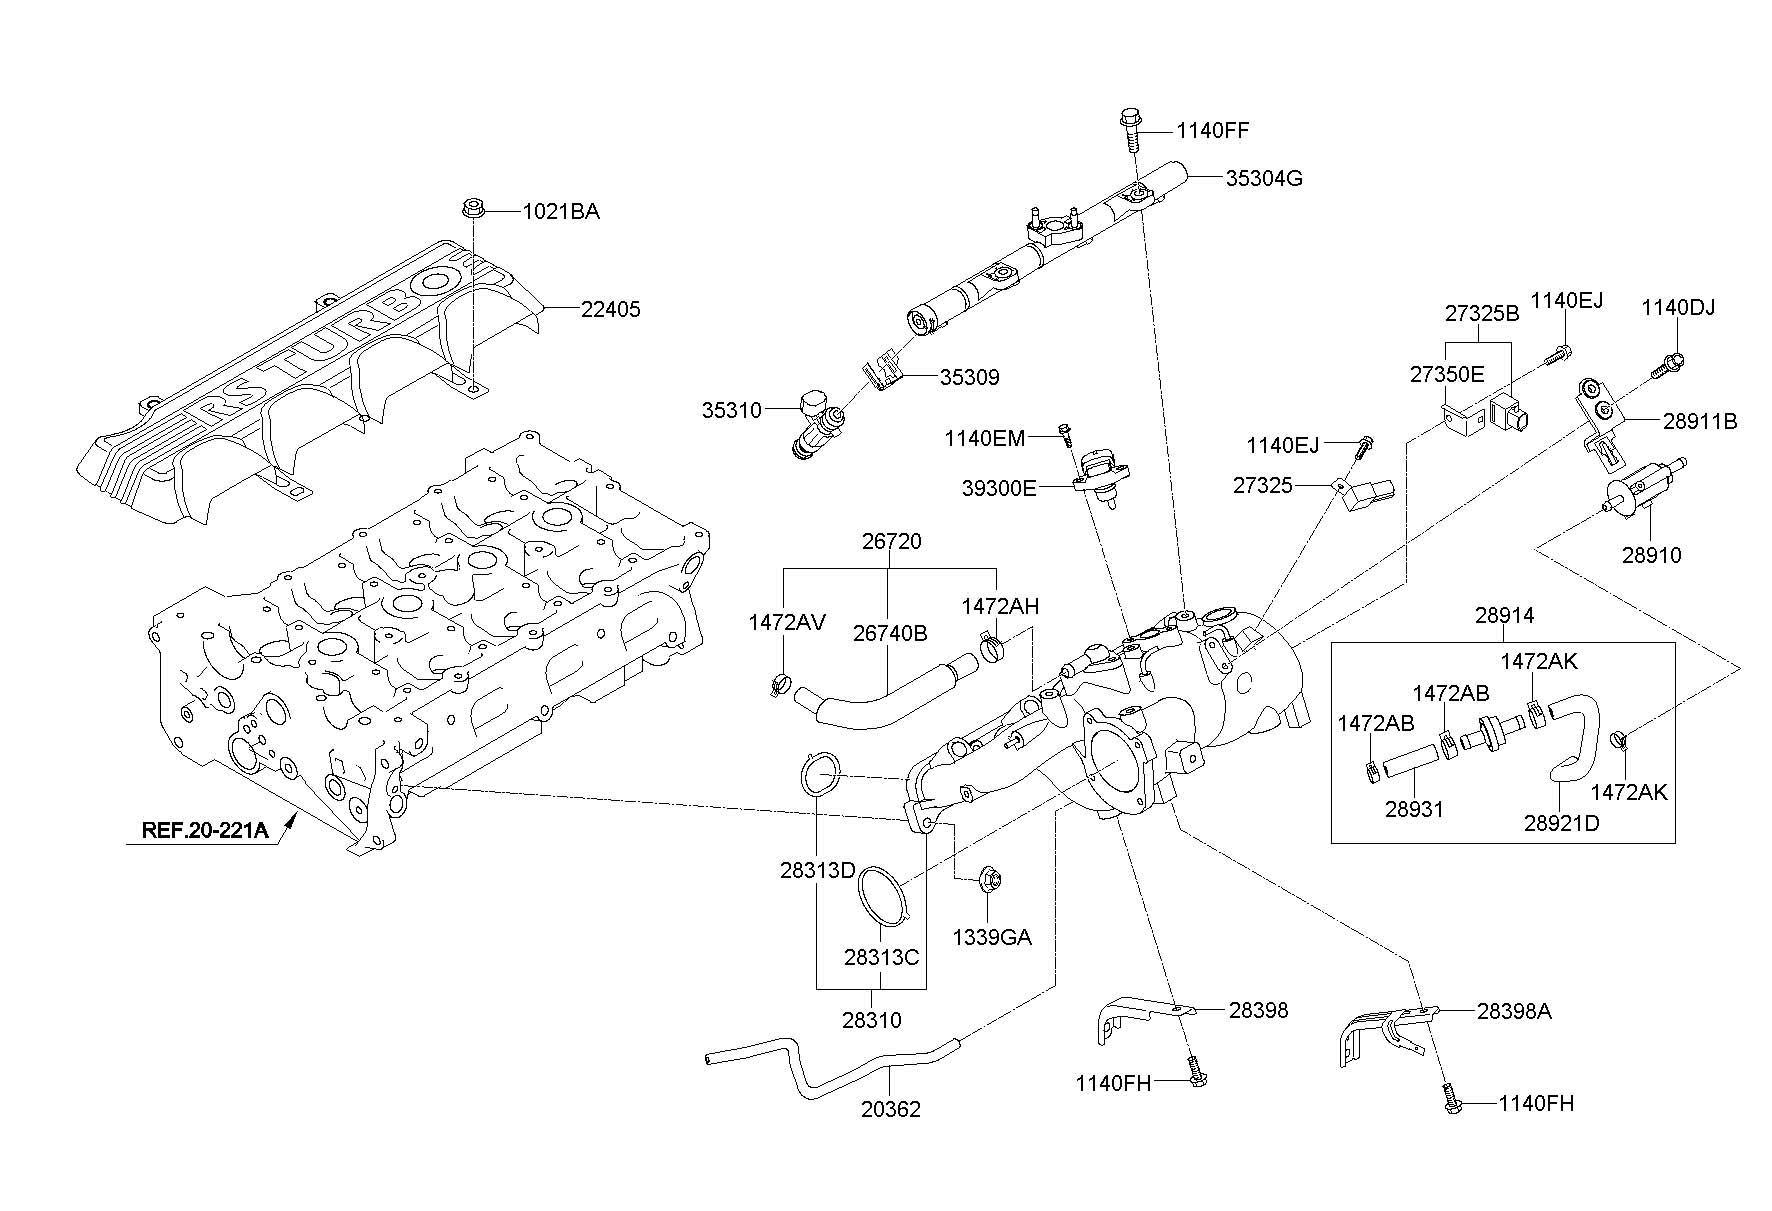 hight resolution of 01 santa fe transmission problems imageresizertool com 2001 hyundai santa fe fuel pump wiring diagram hyundai santa fe tail light wiring diagram